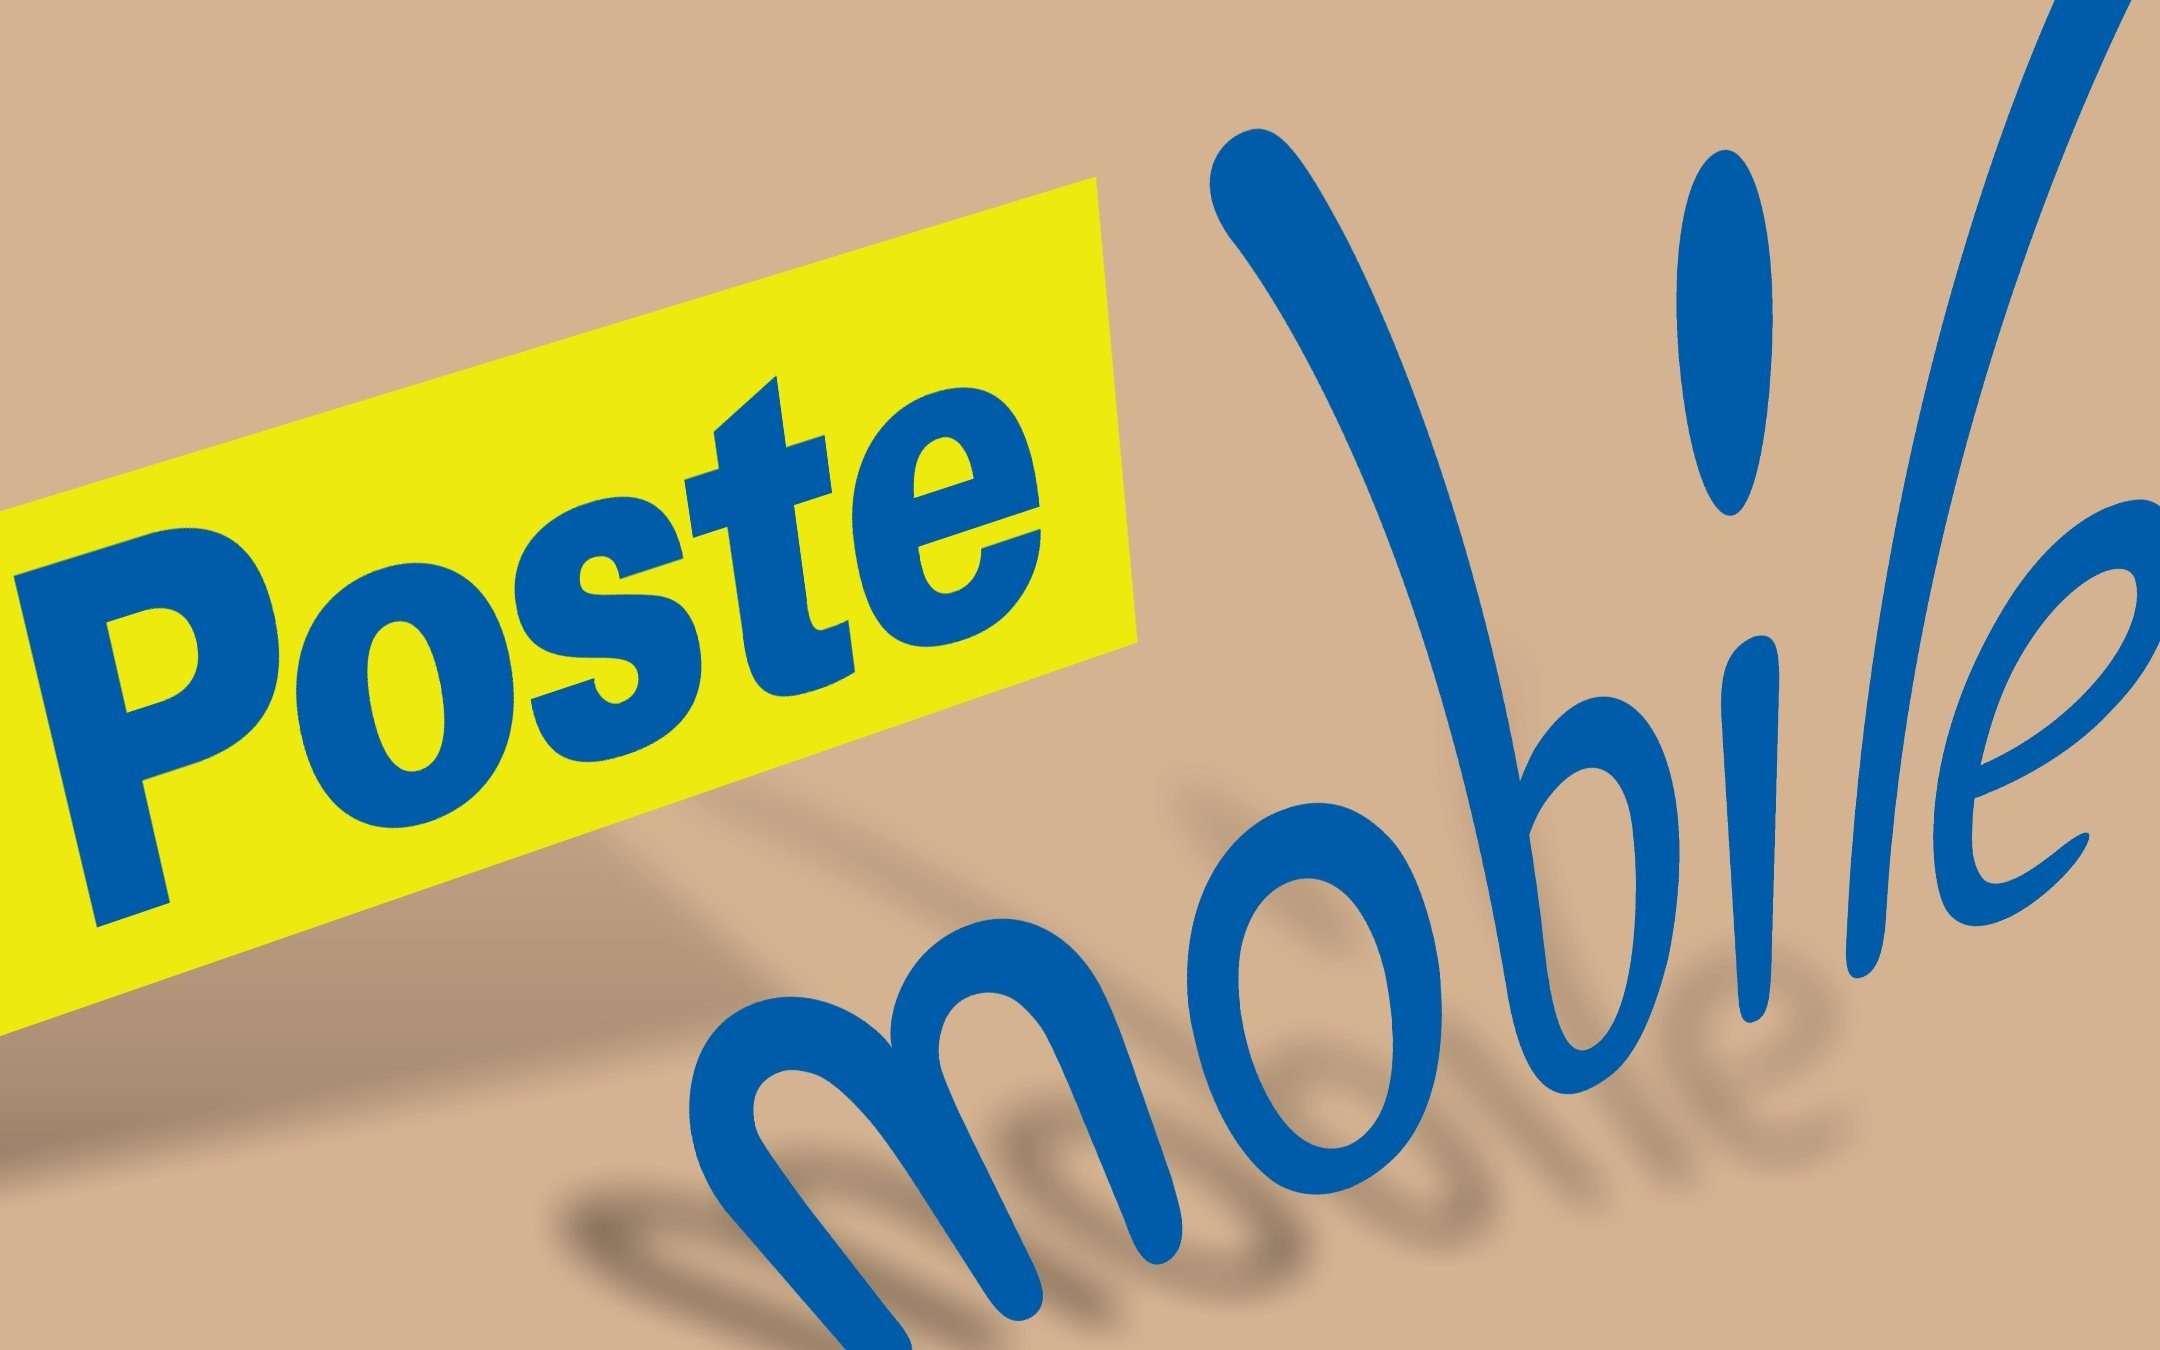 PosteMobile, bonus se si portano nuovi clienti